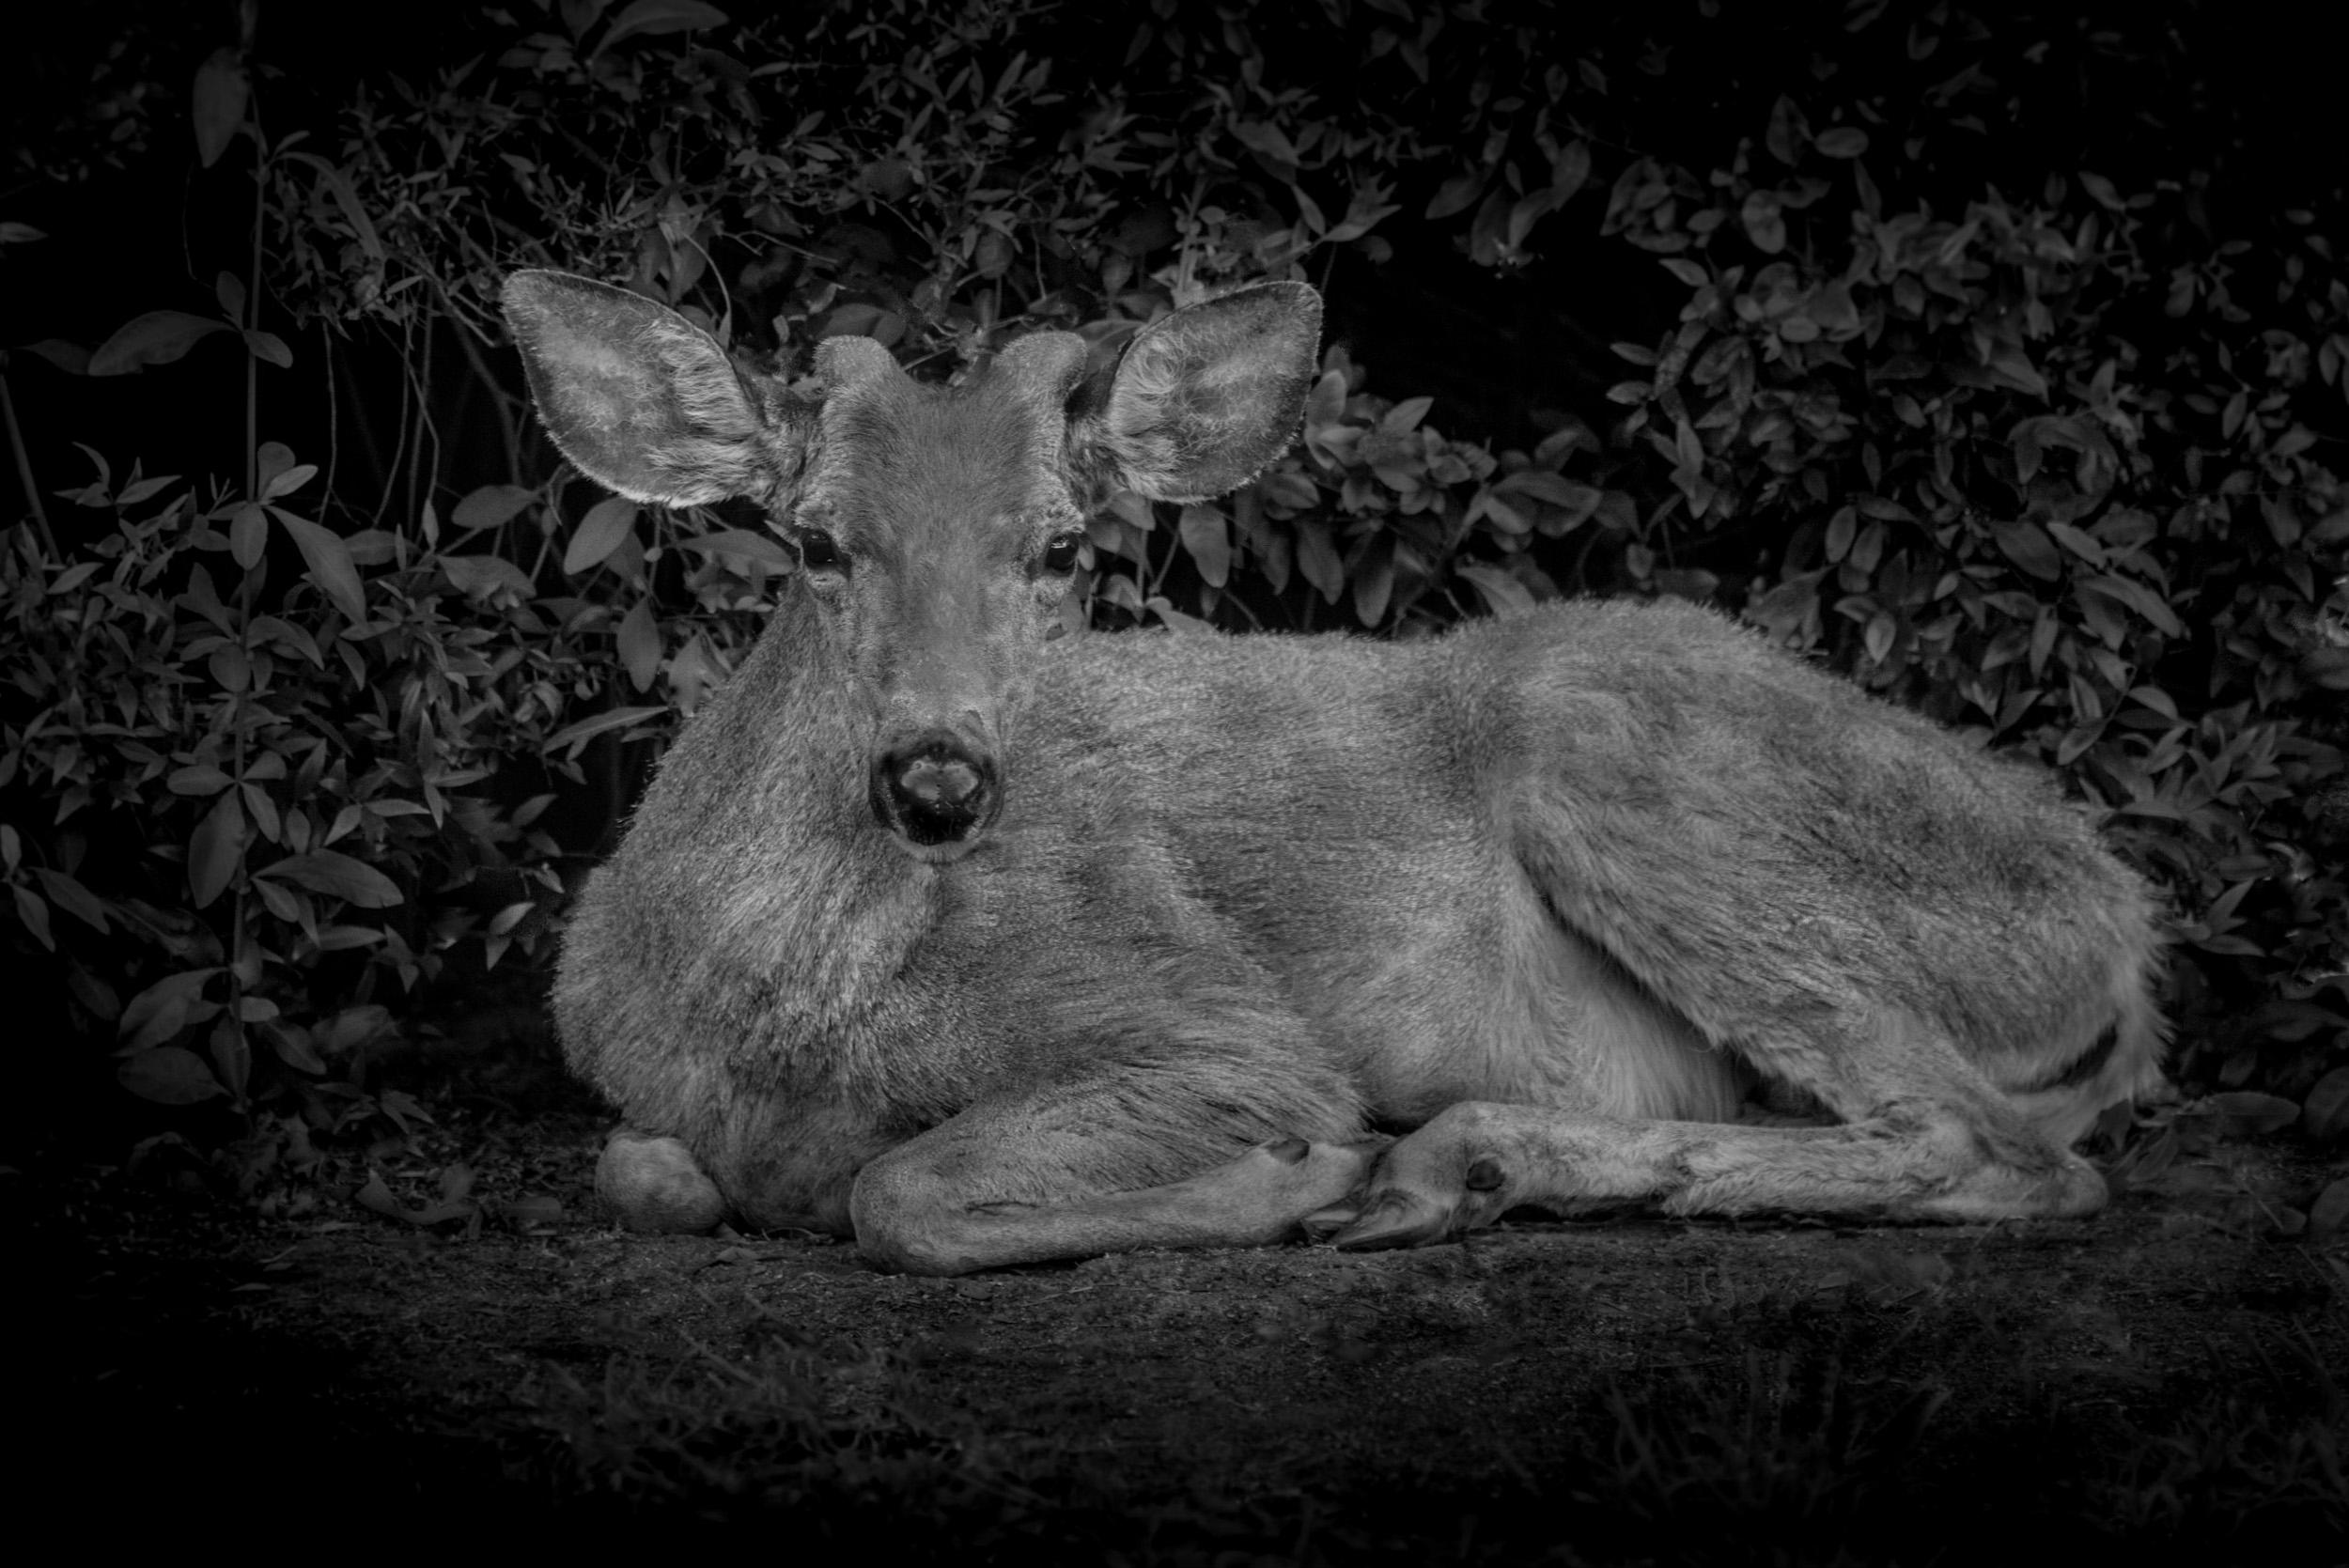 Deer Sitting, Monrovia, California © Robert Welkie 2019